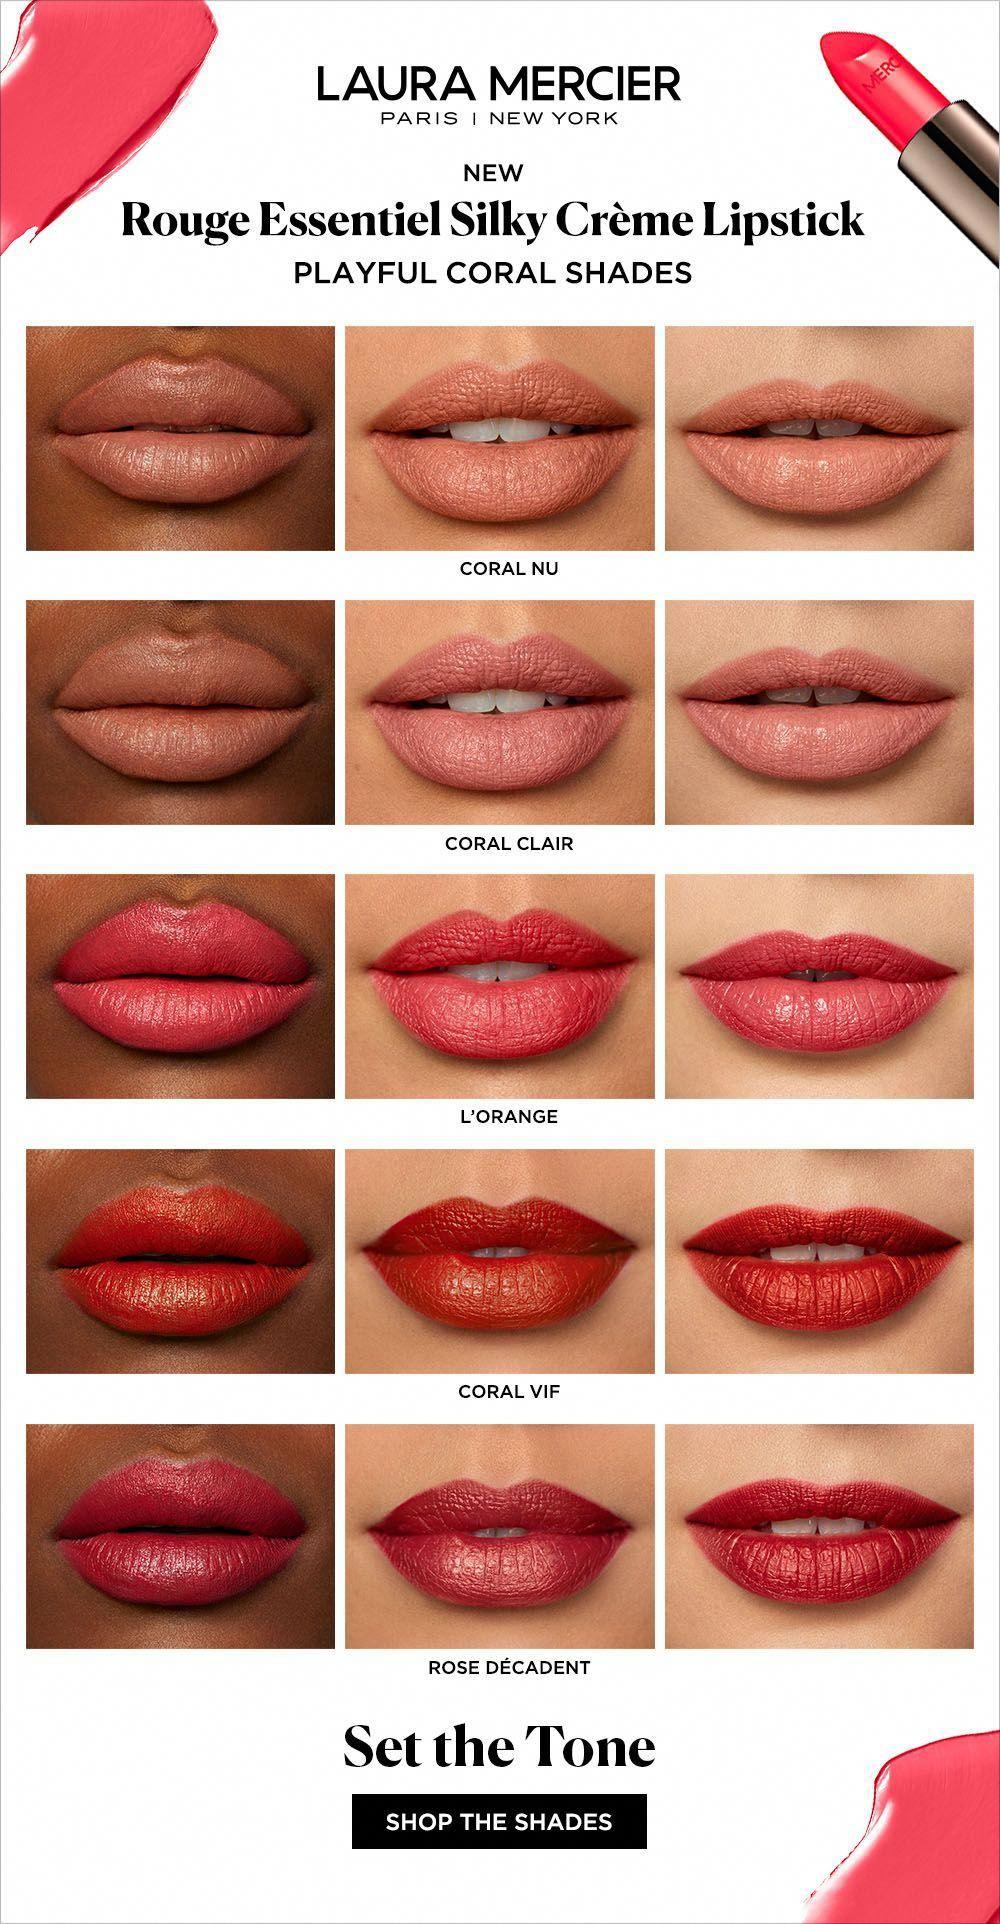 Rouge Essentiel Lipstick Laura Mercier Coral Lipstick Skin Care How To Make Lipstick